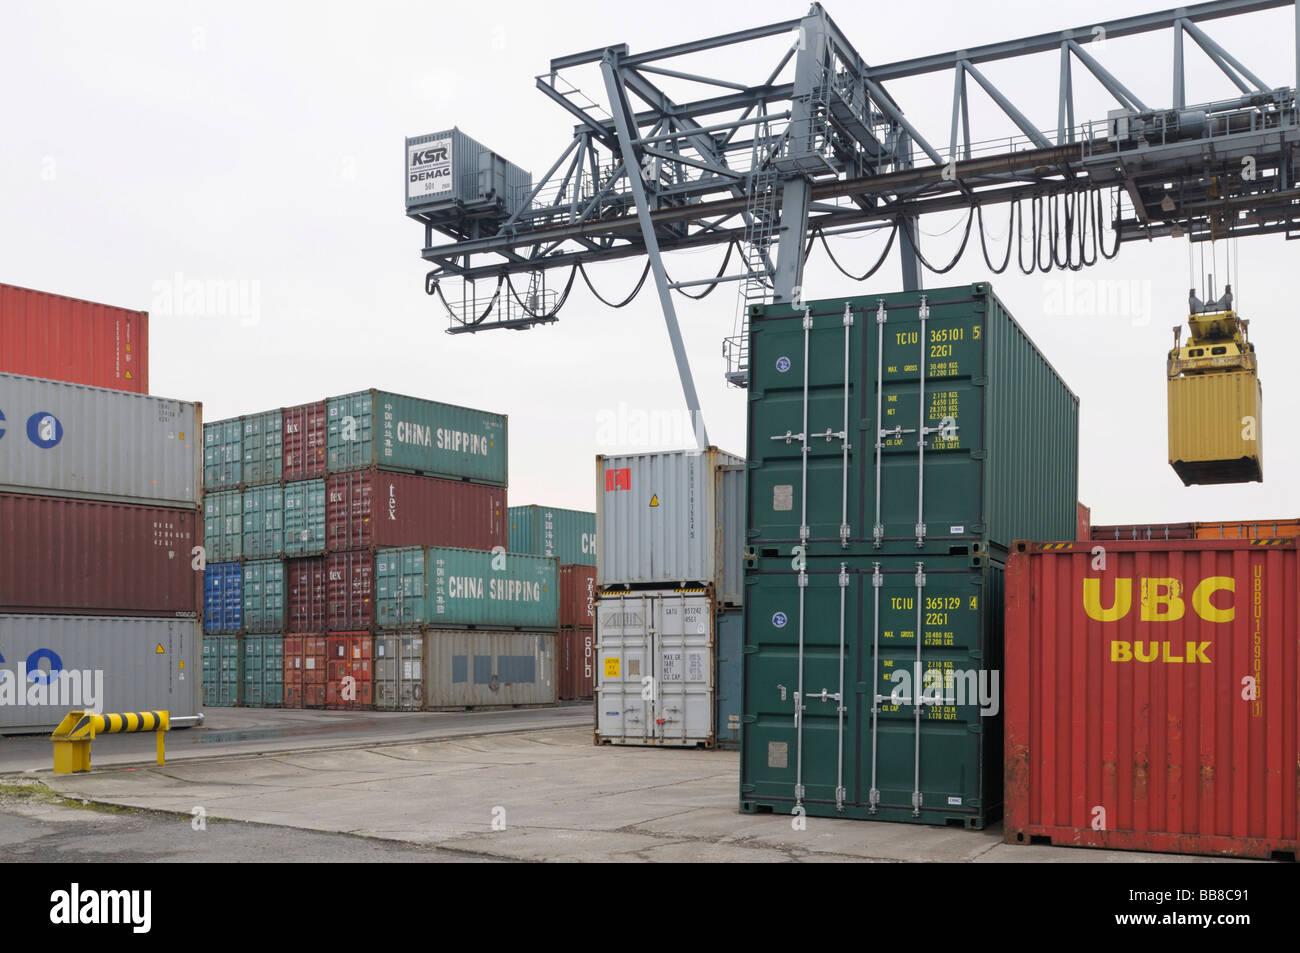 Bonn Container Terminal, gantry crane lifting a container, bimodal handling, North Rhine-Westphalia, Germany, Europe Stock Photo